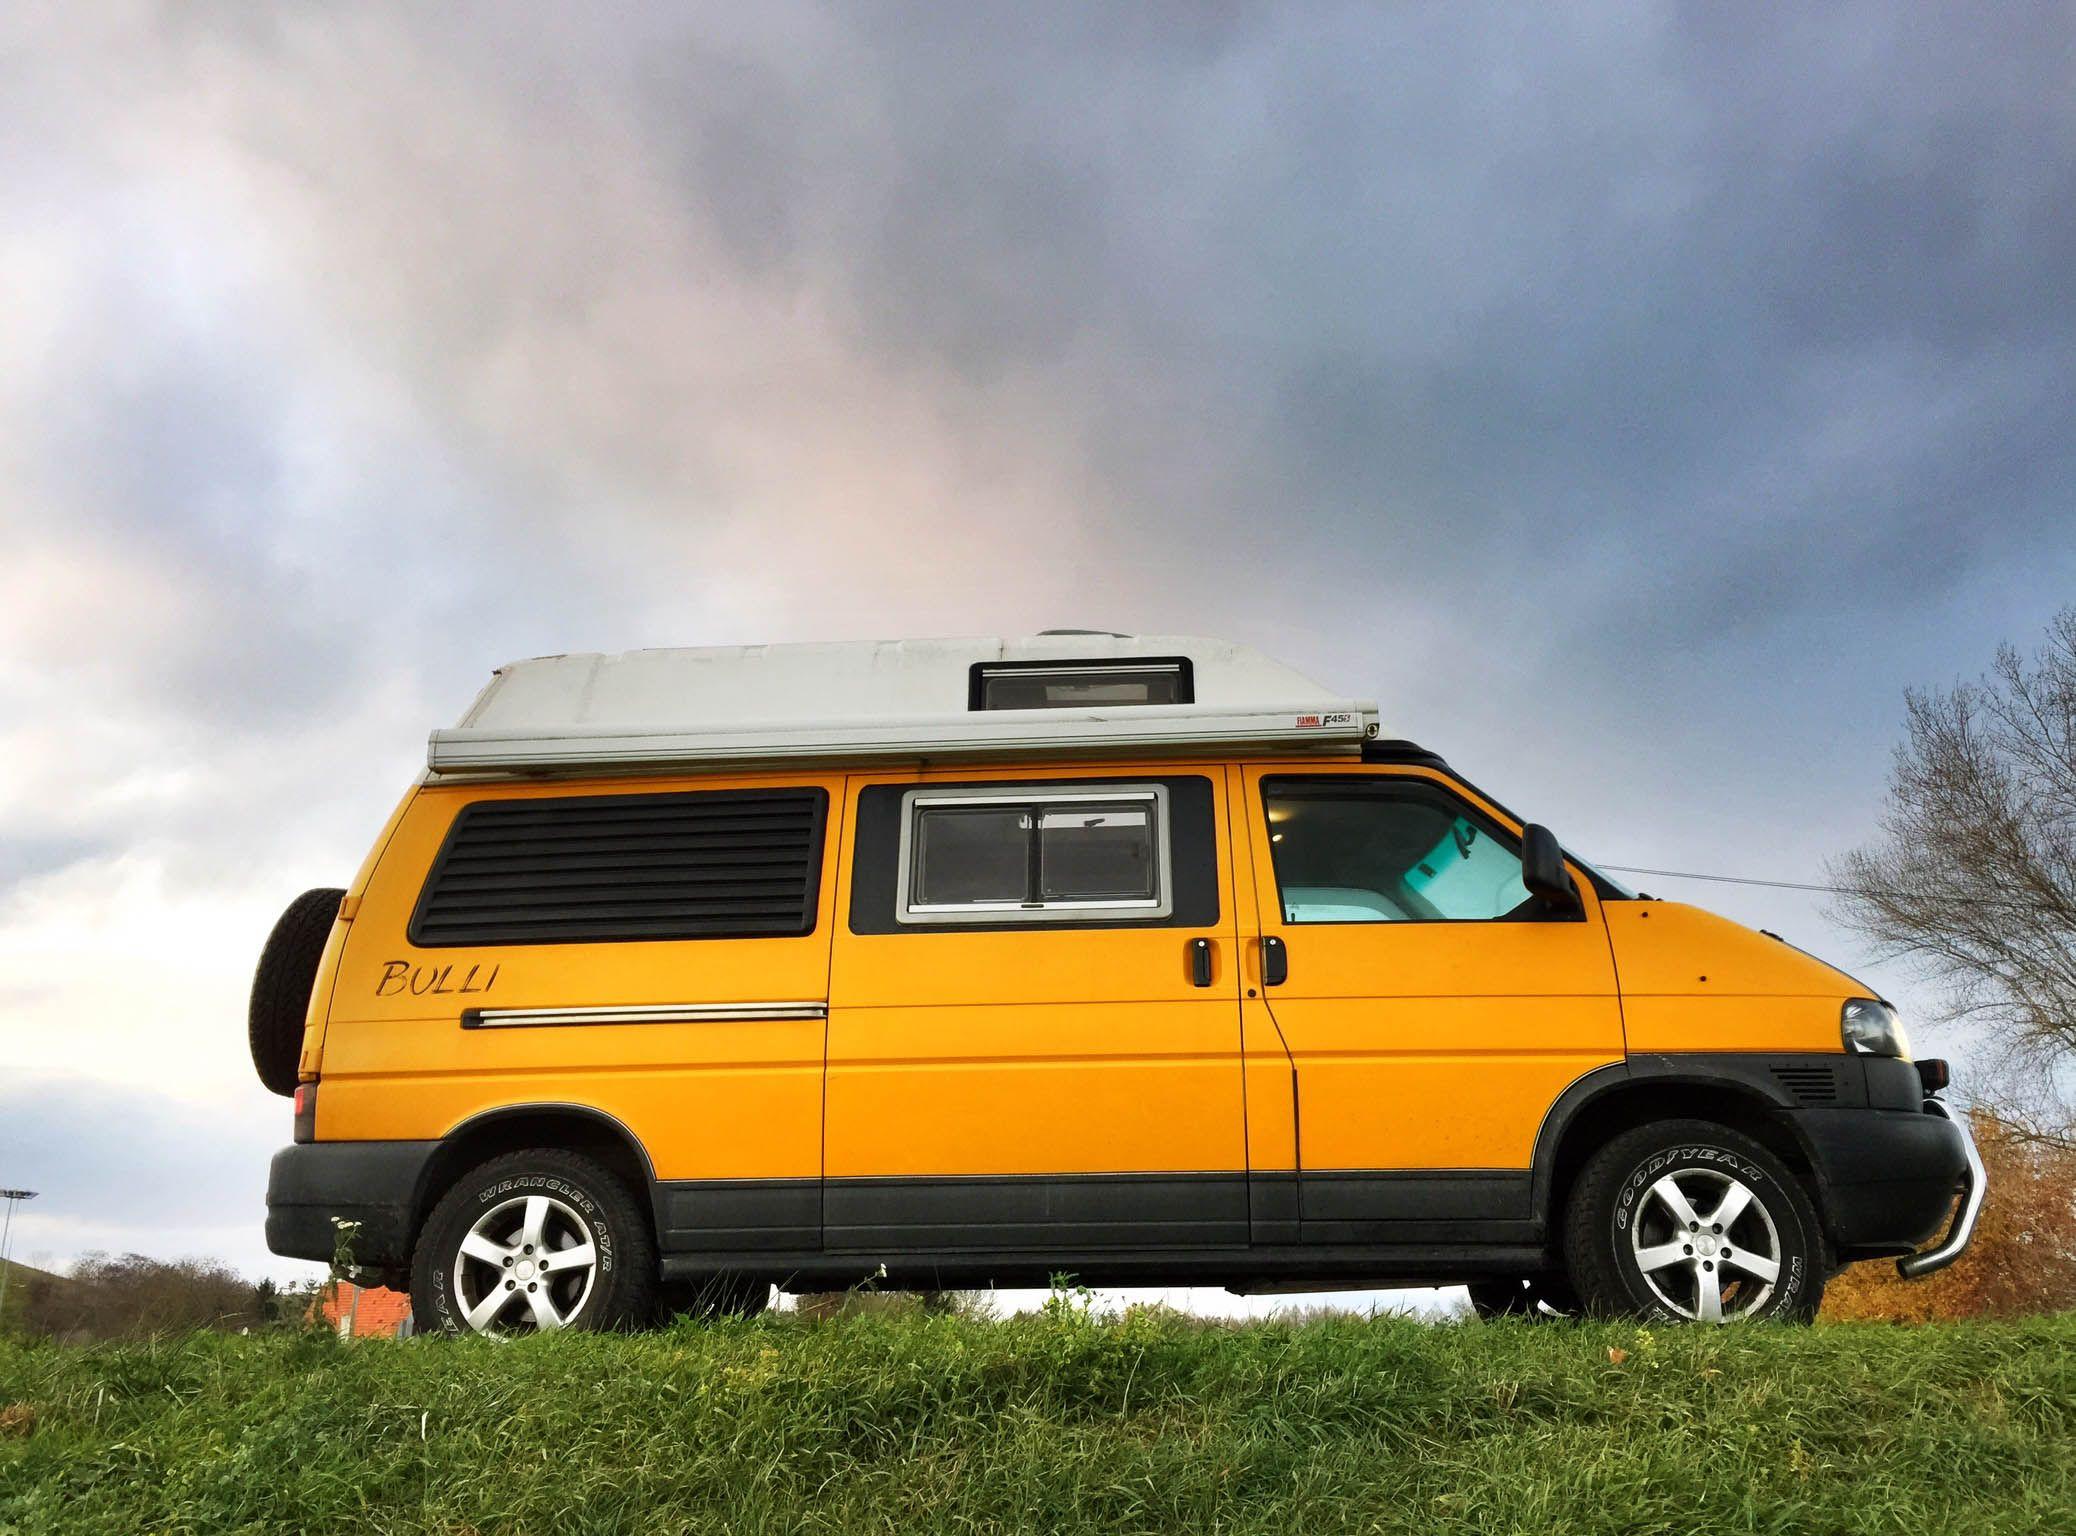 VW T4 Syncro Homemade Camper Van, Vw T4 Syncro, T4 Camper, Campers,